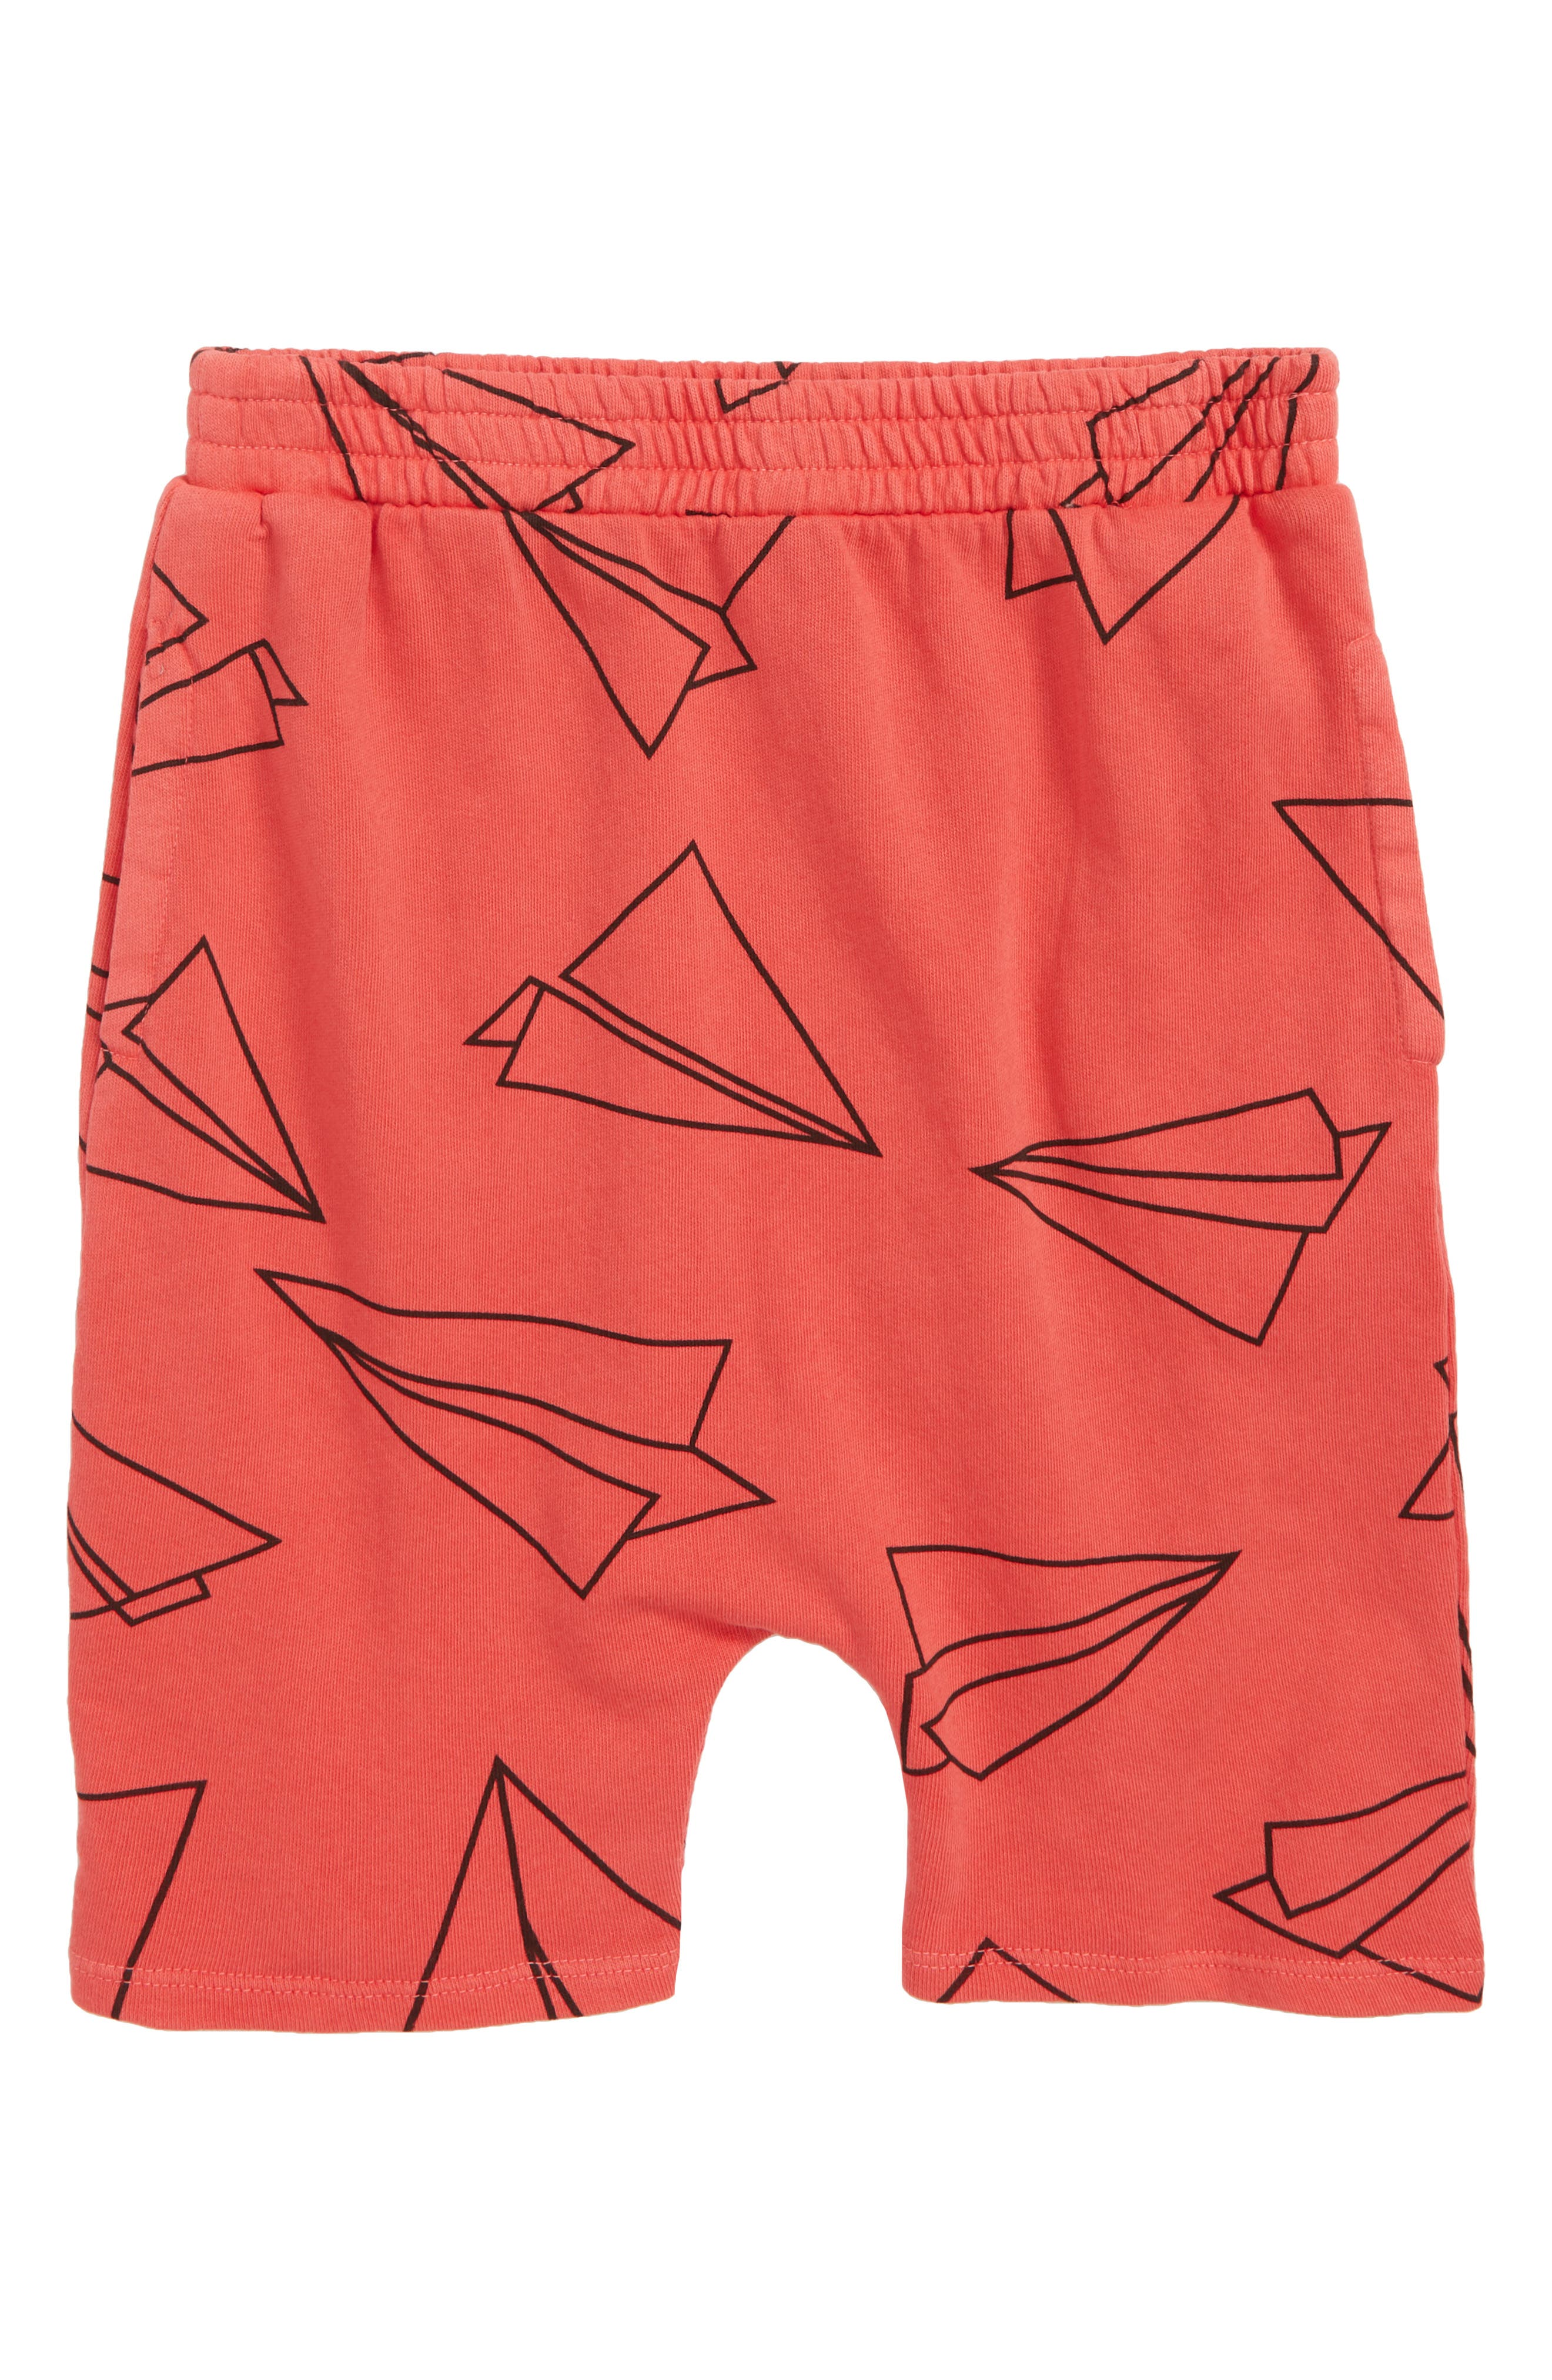 Main Image - Stem Print Shorts (Toddler Boys, Little Boys & Big Boys)